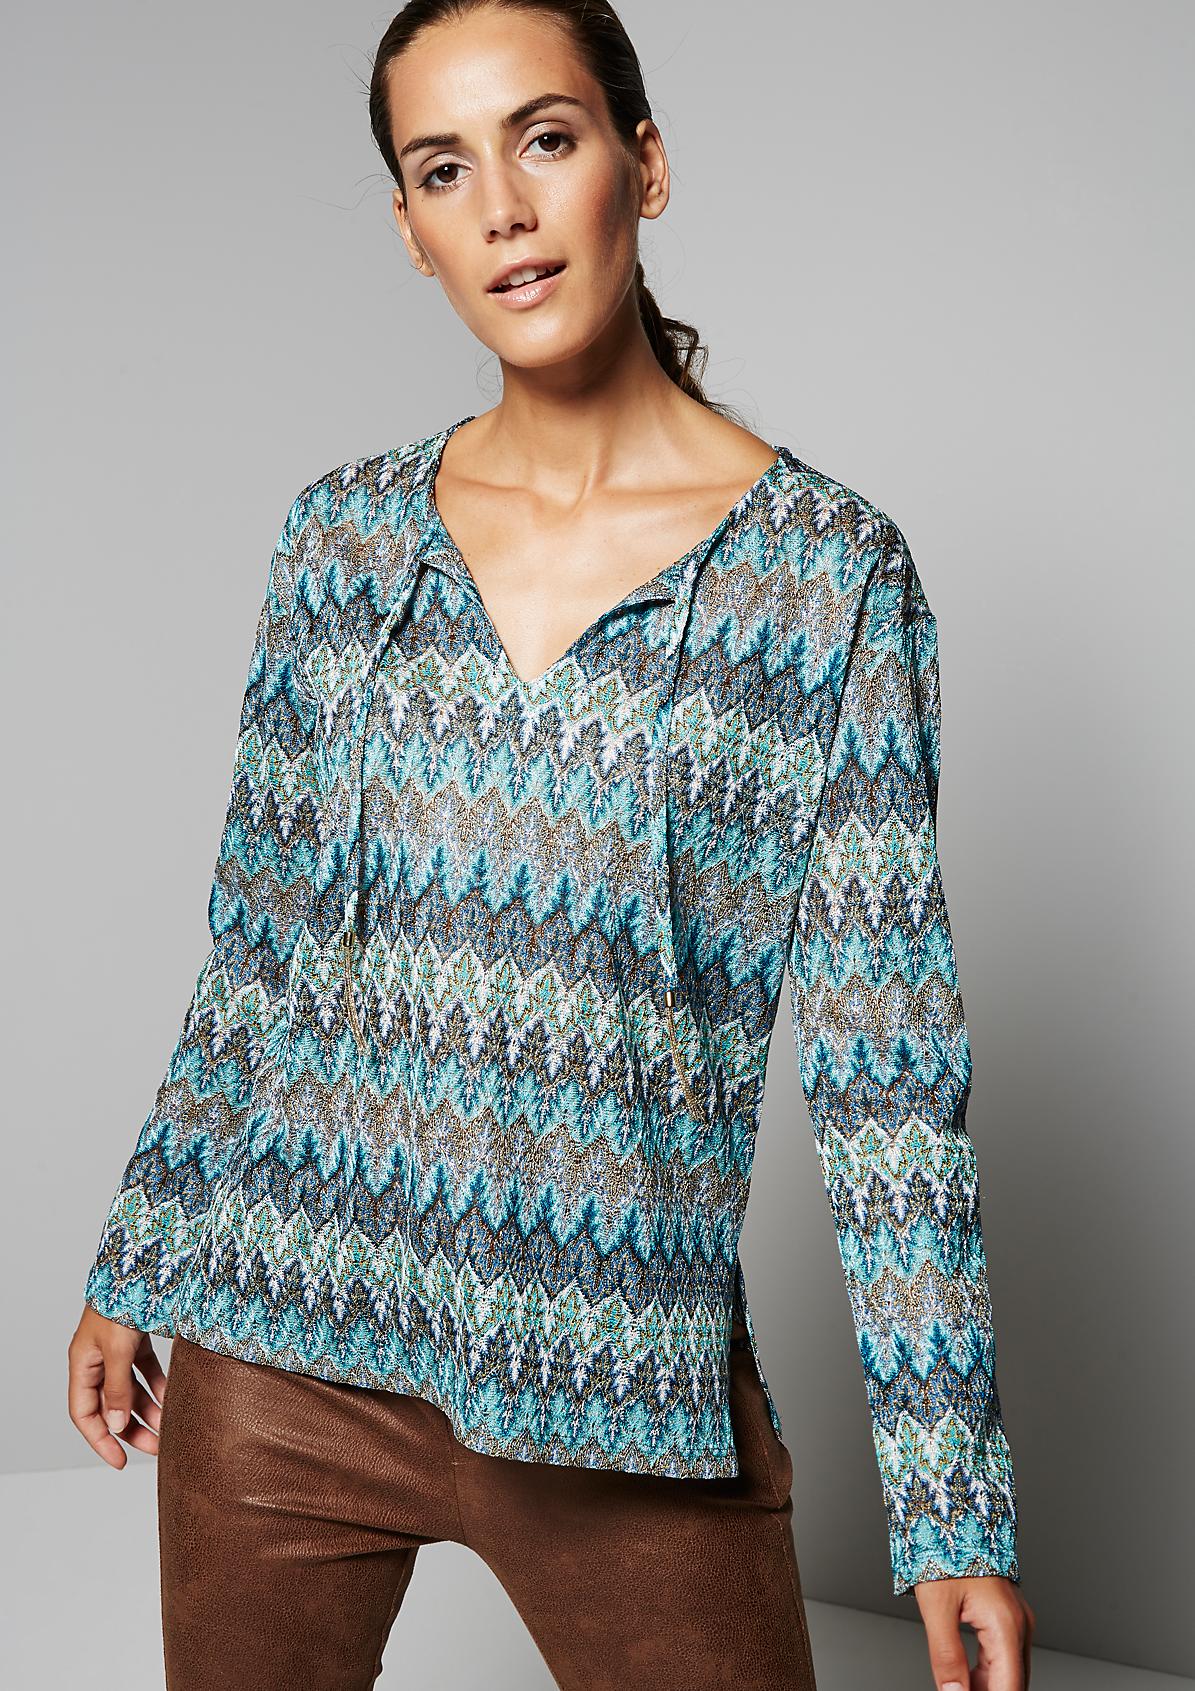 Glamouröses Langarmshirt mit farbenprächtigem Ethnomuster